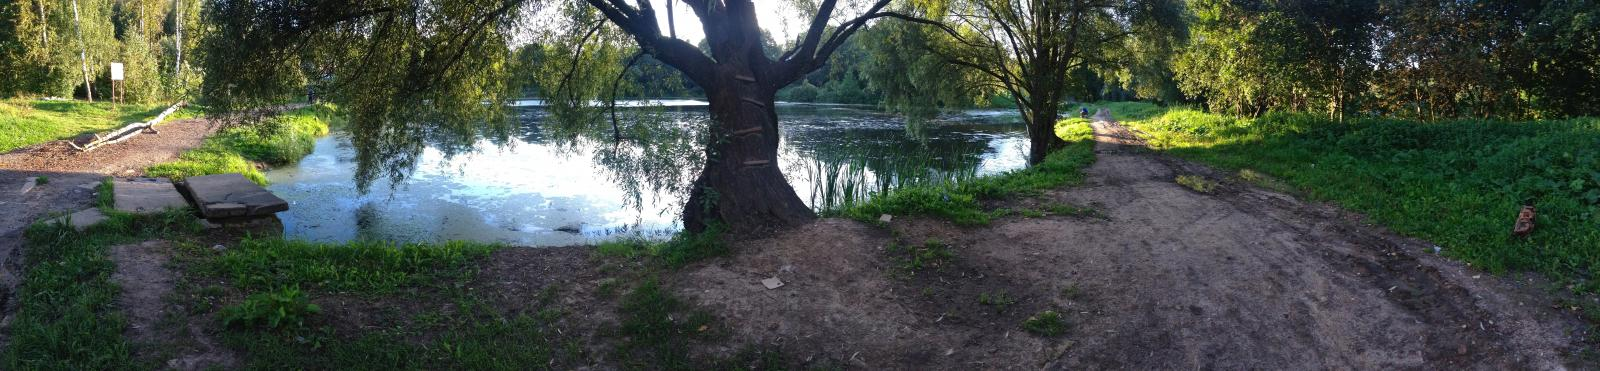 Мешковский пруд зацвел